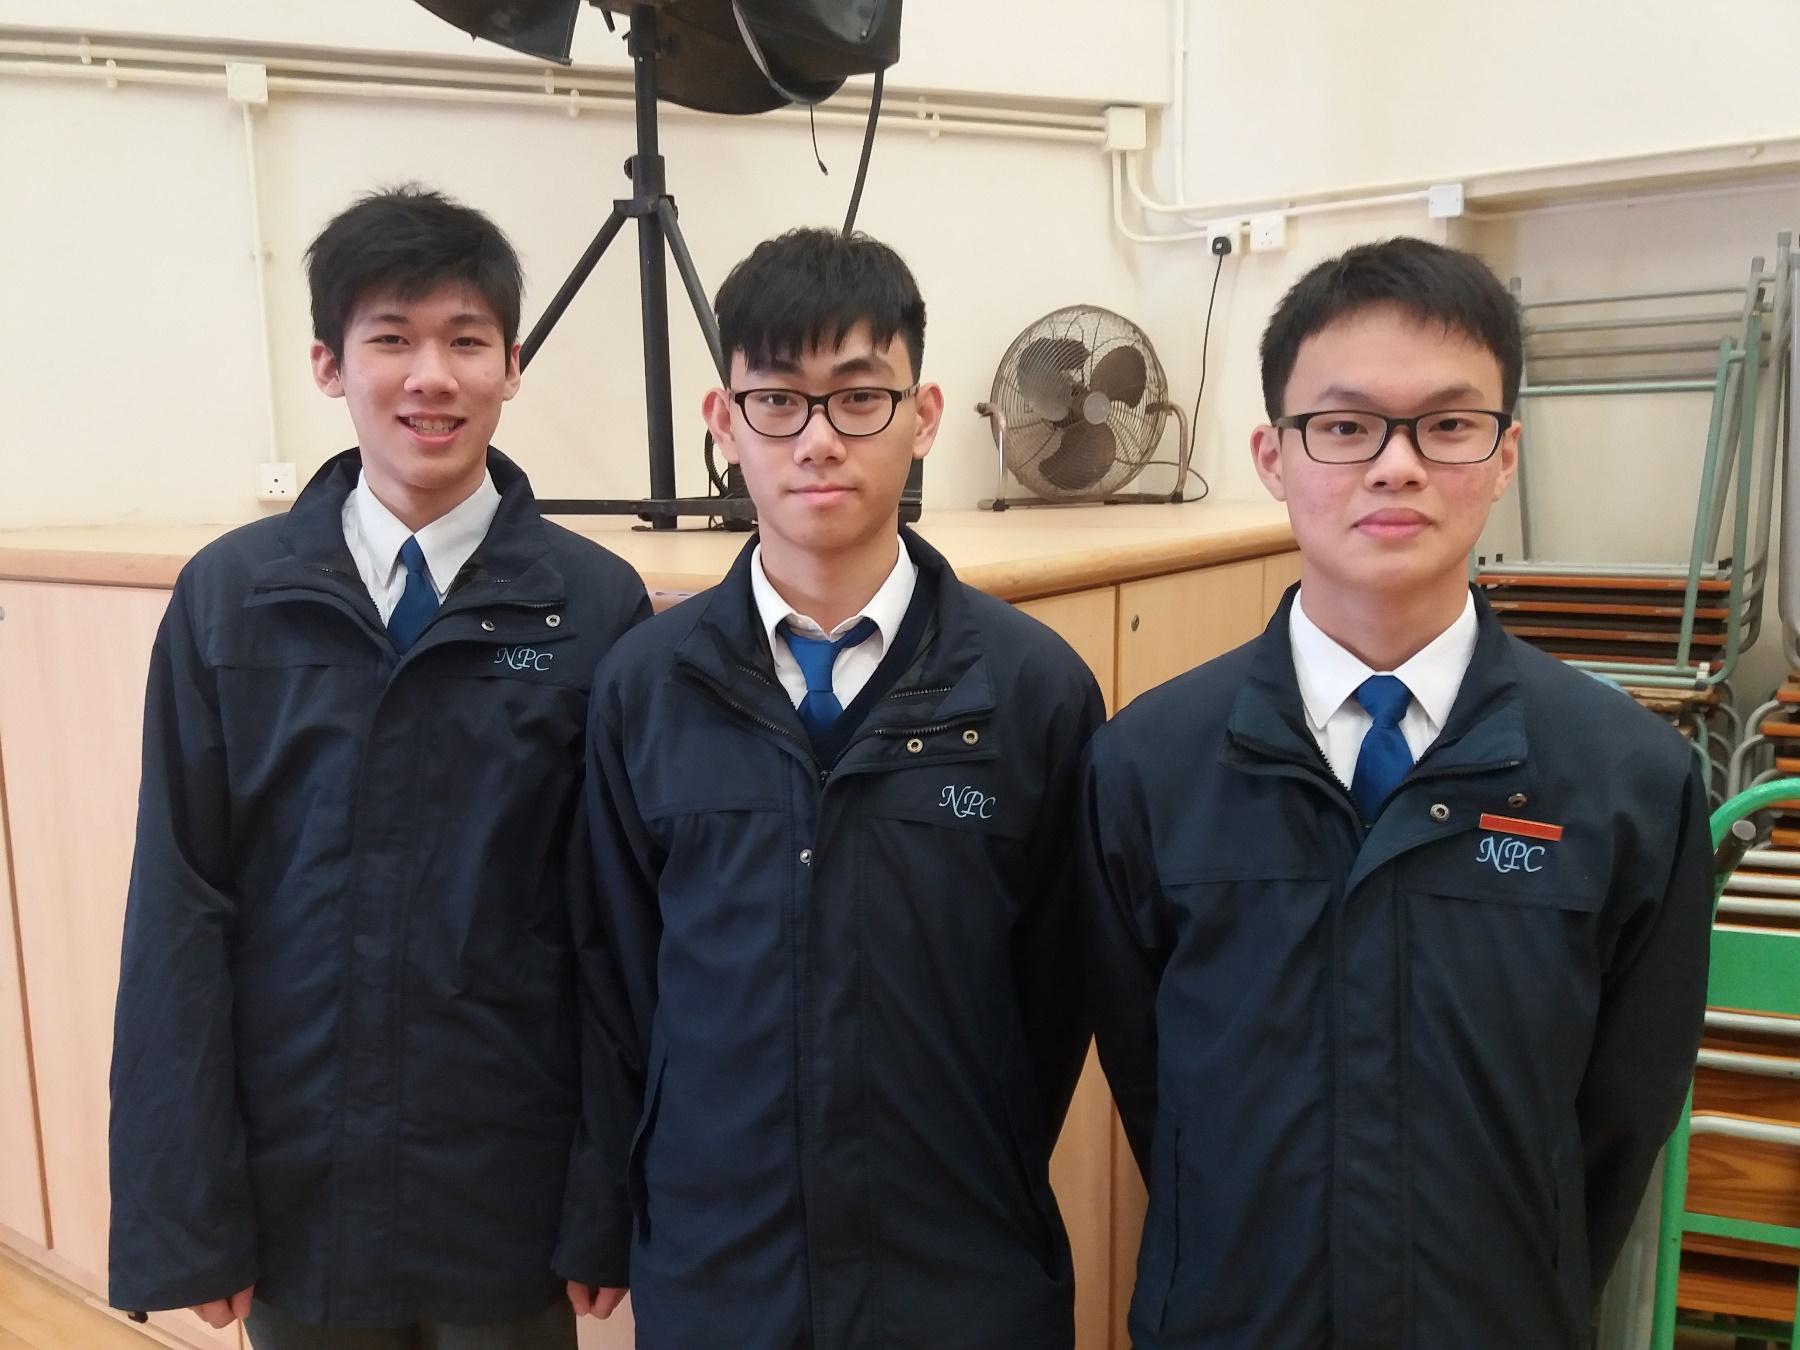 http://npc.edu.hk/sites/default/files/20190123_132553.jpg